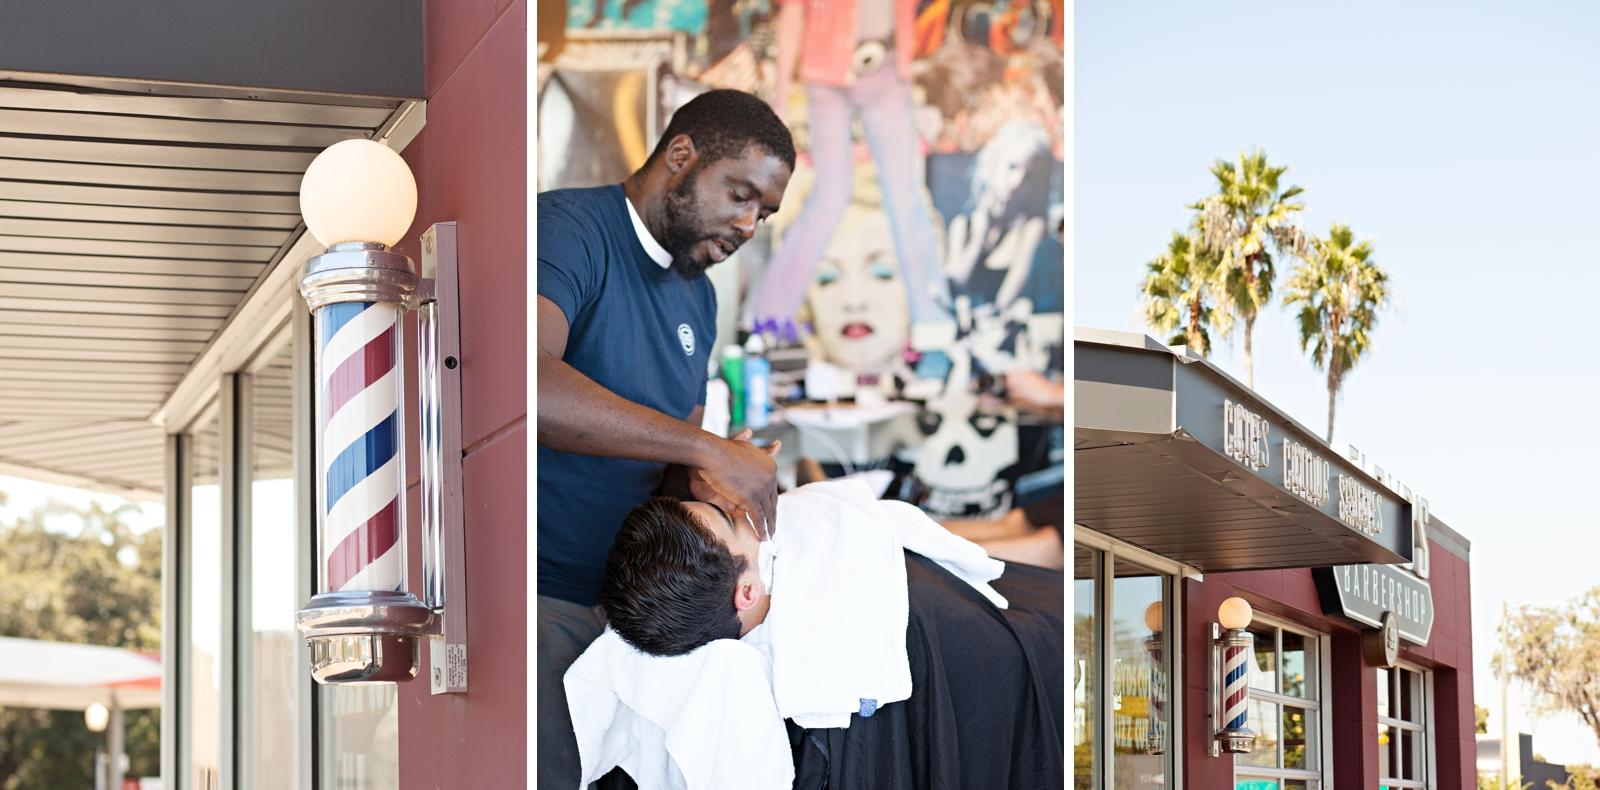 floyds barbershop winter park